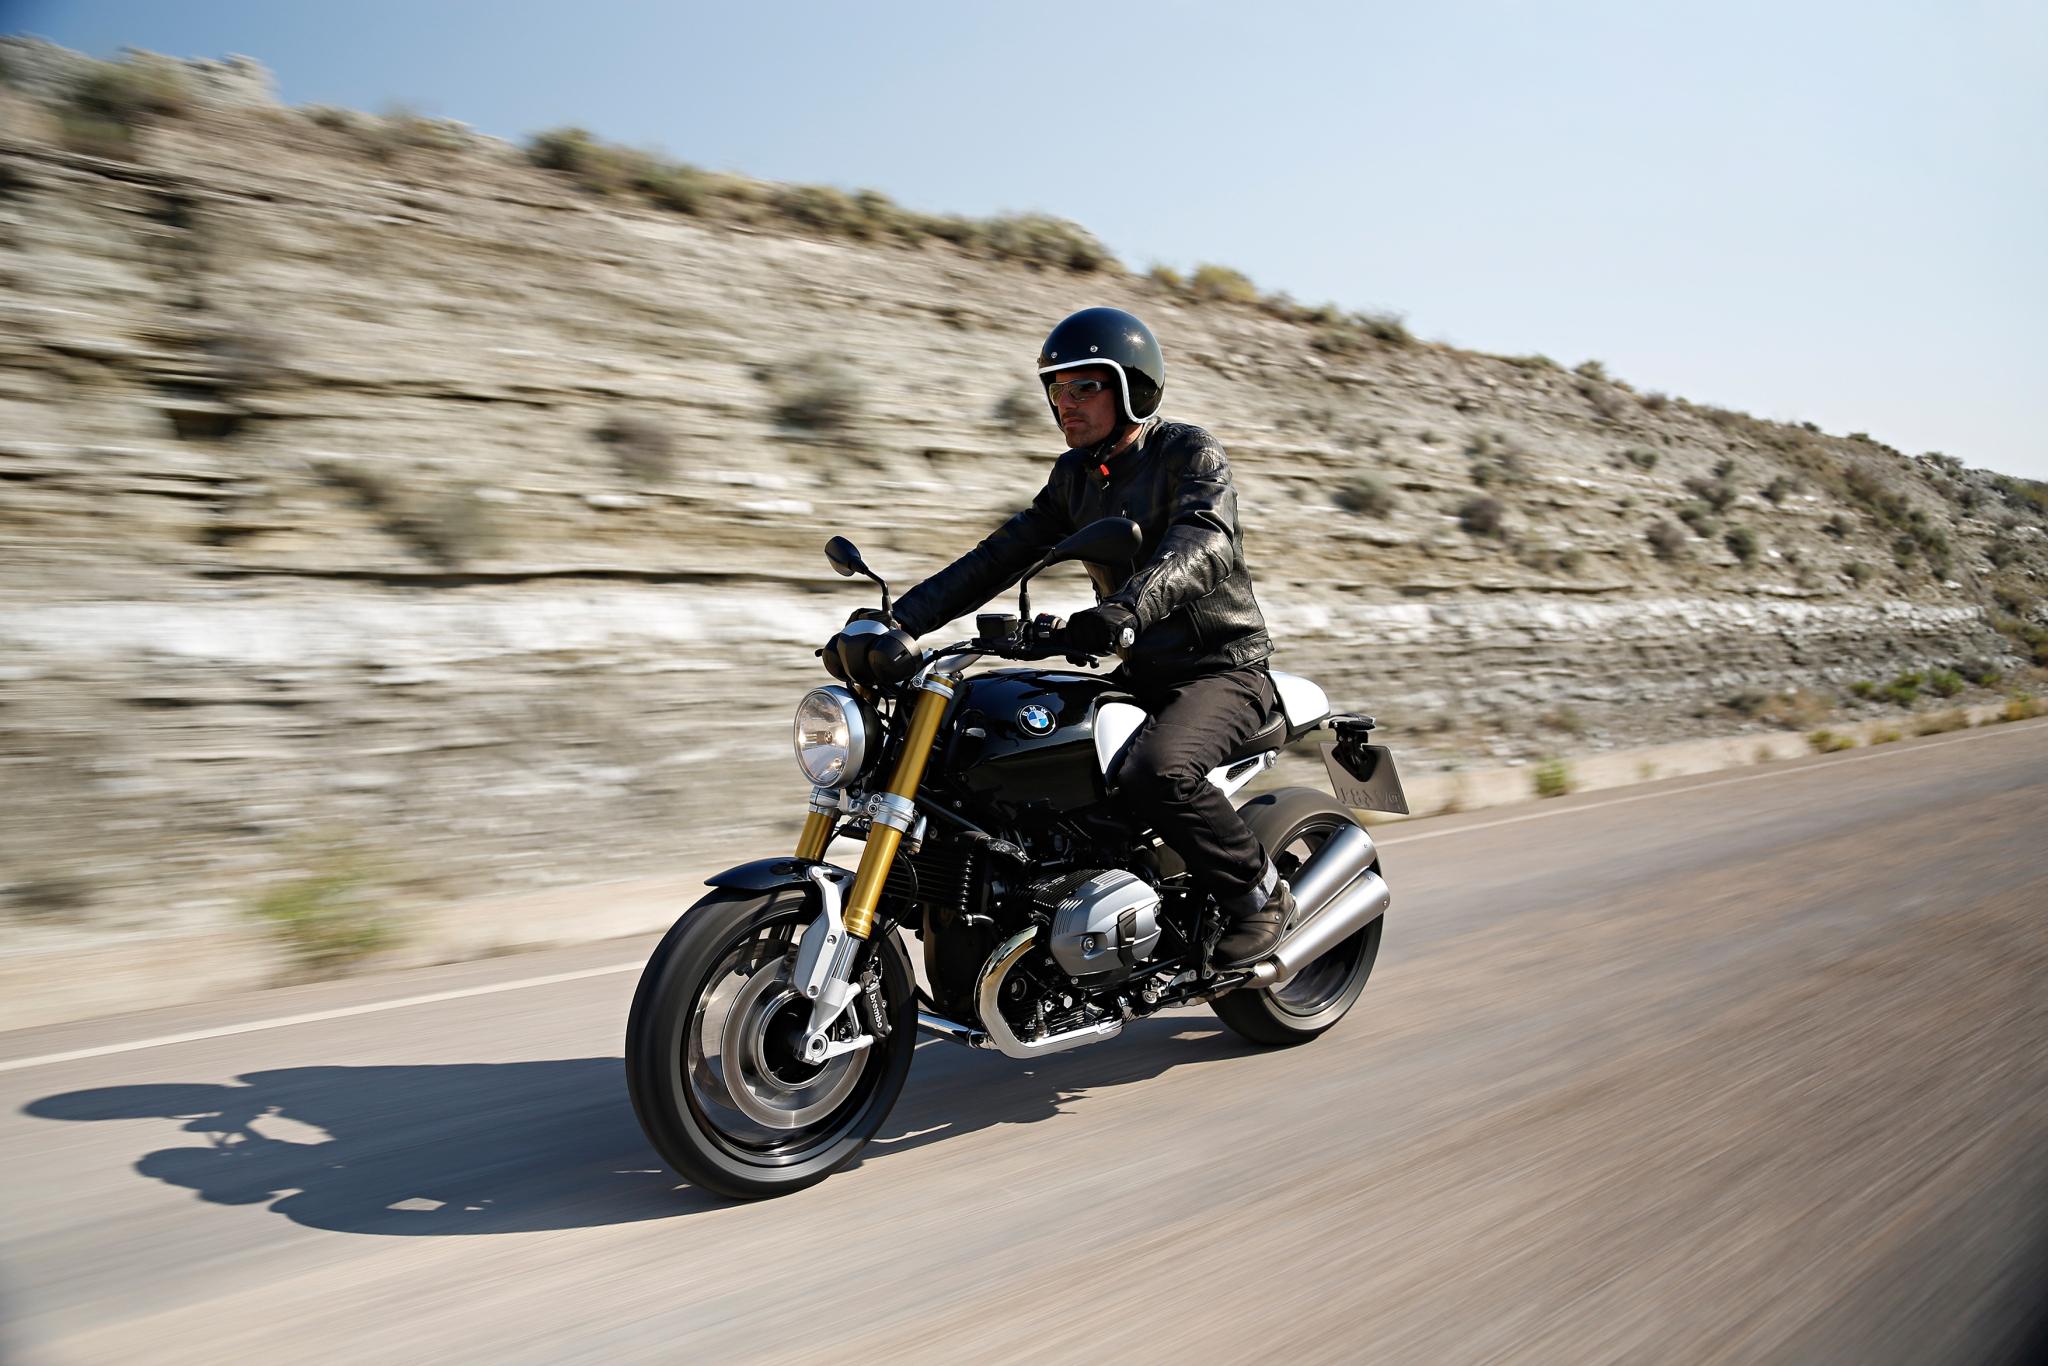 bmw r ninet is motorcycle xxx autoevolution. Black Bedroom Furniture Sets. Home Design Ideas